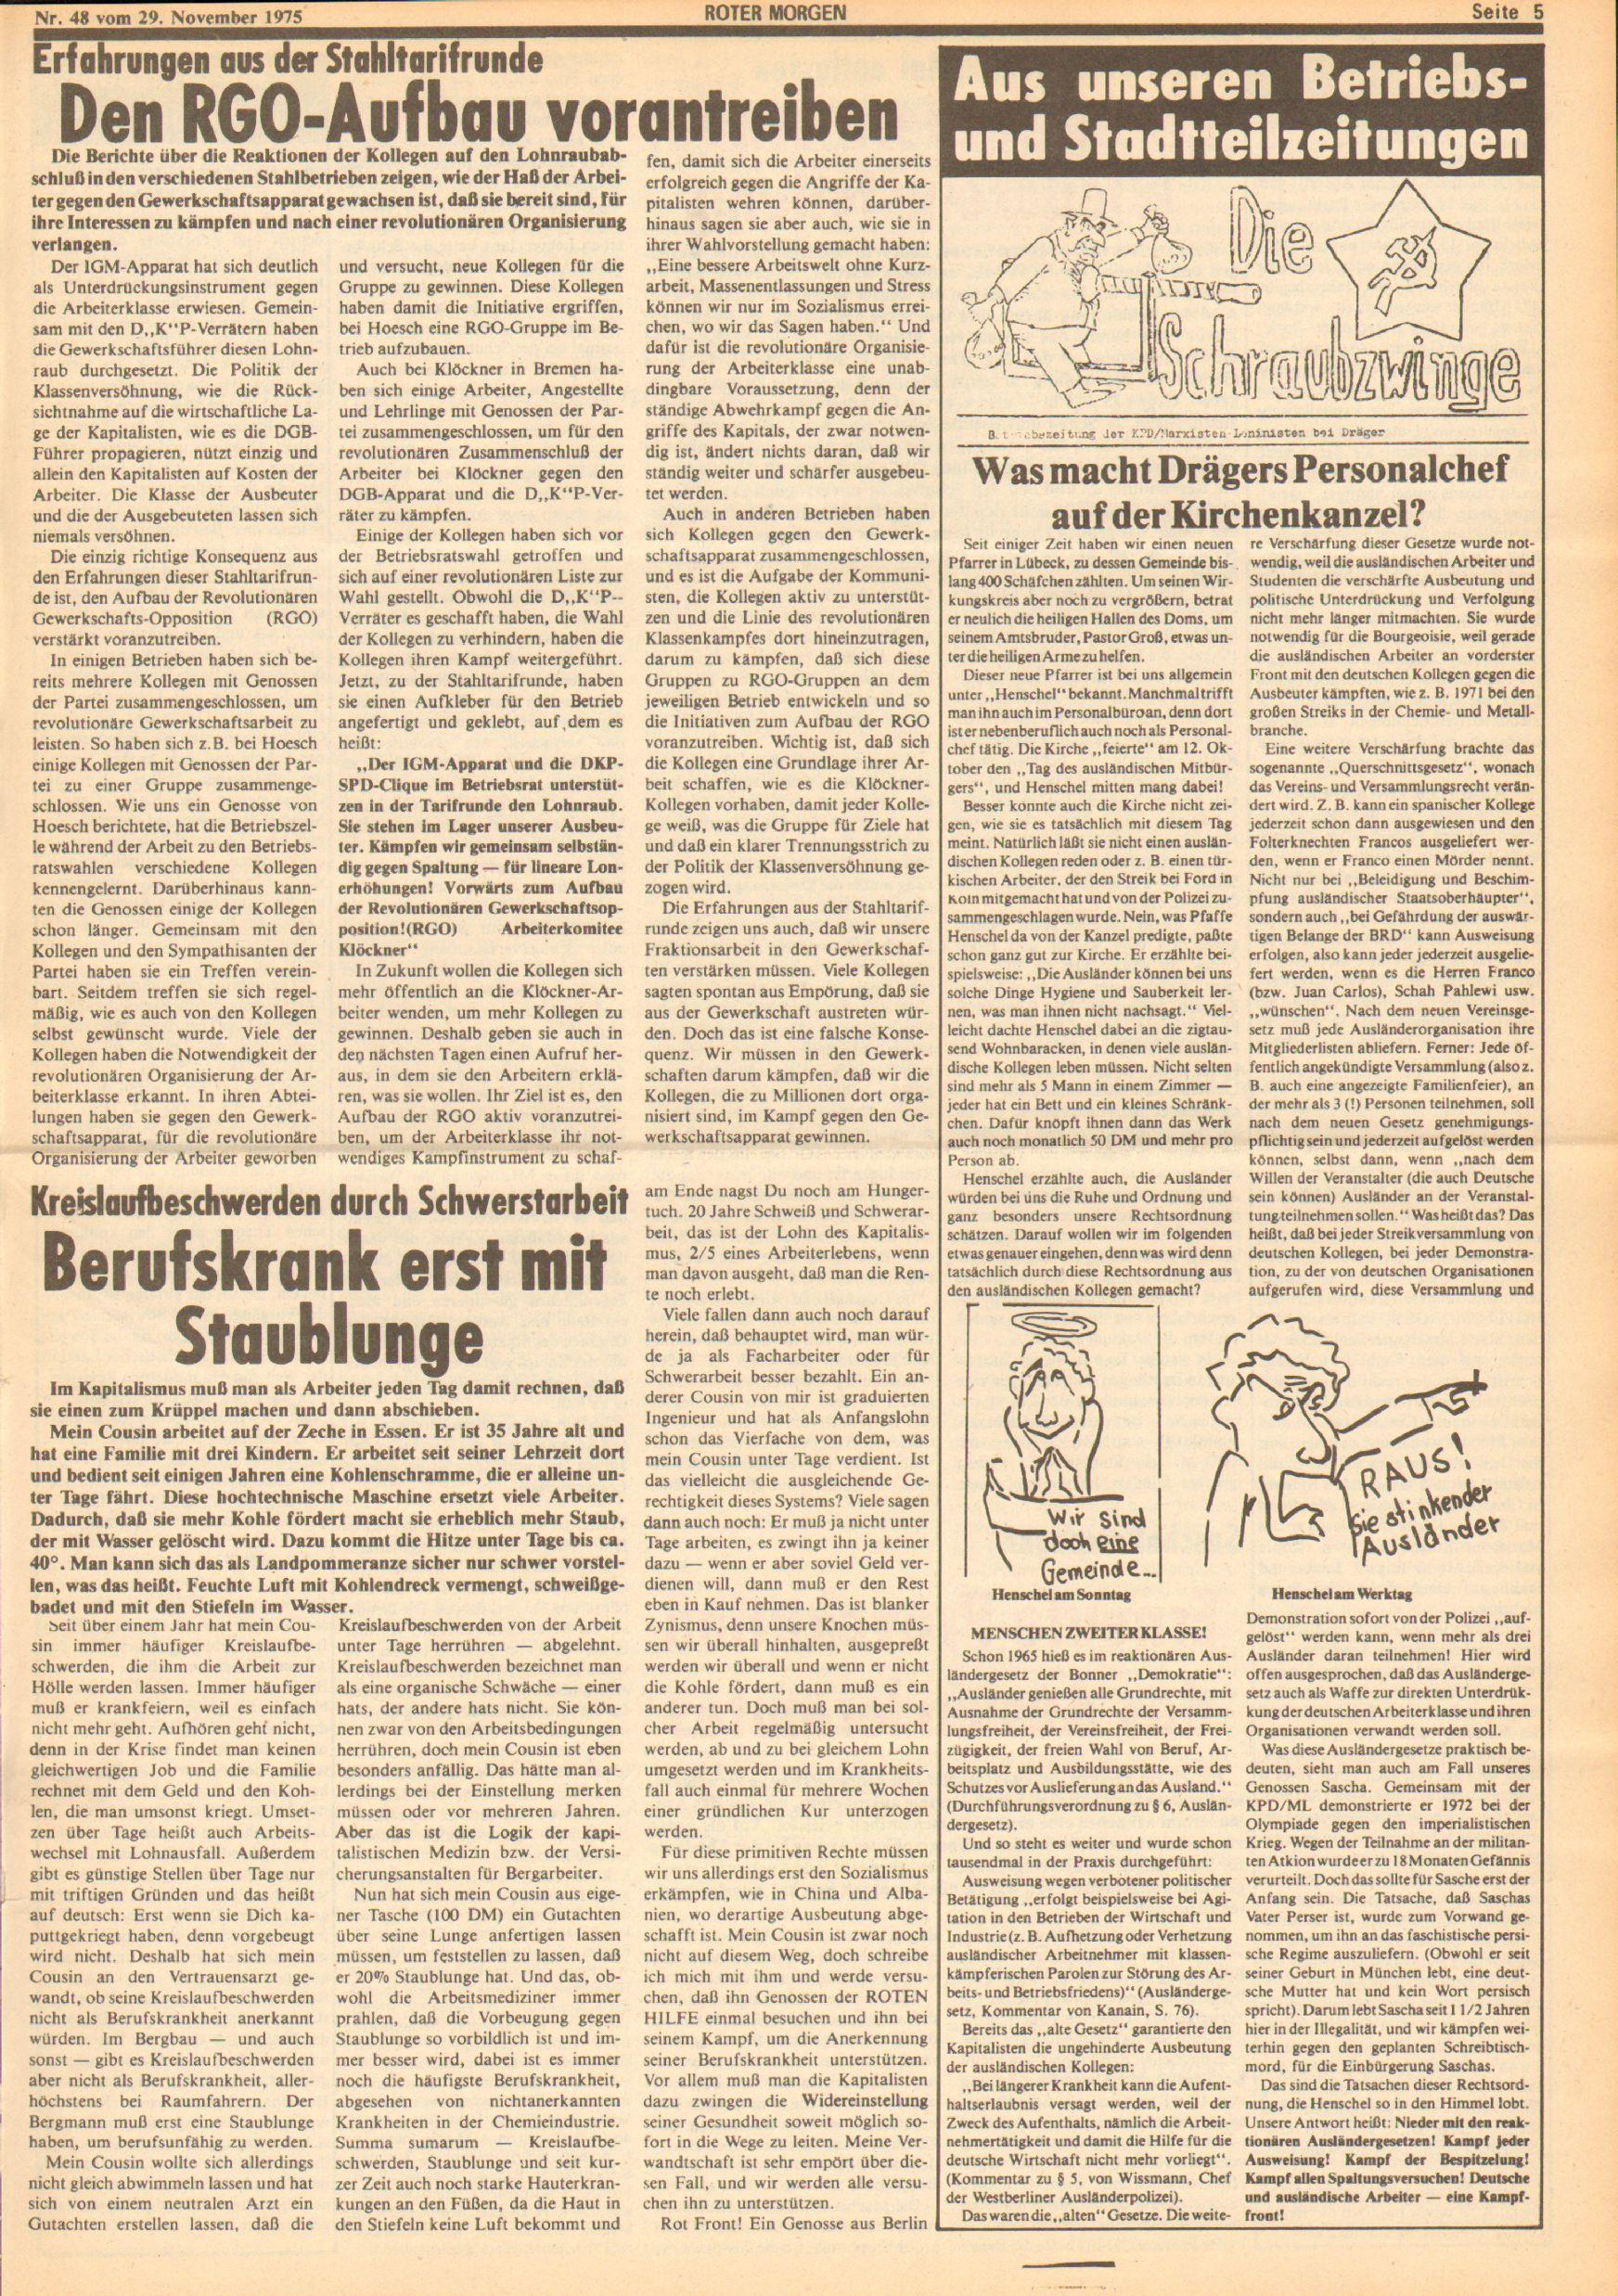 Roter Morgen, 9. Jg., 29. November 1975, Nr. 48, Seite 5